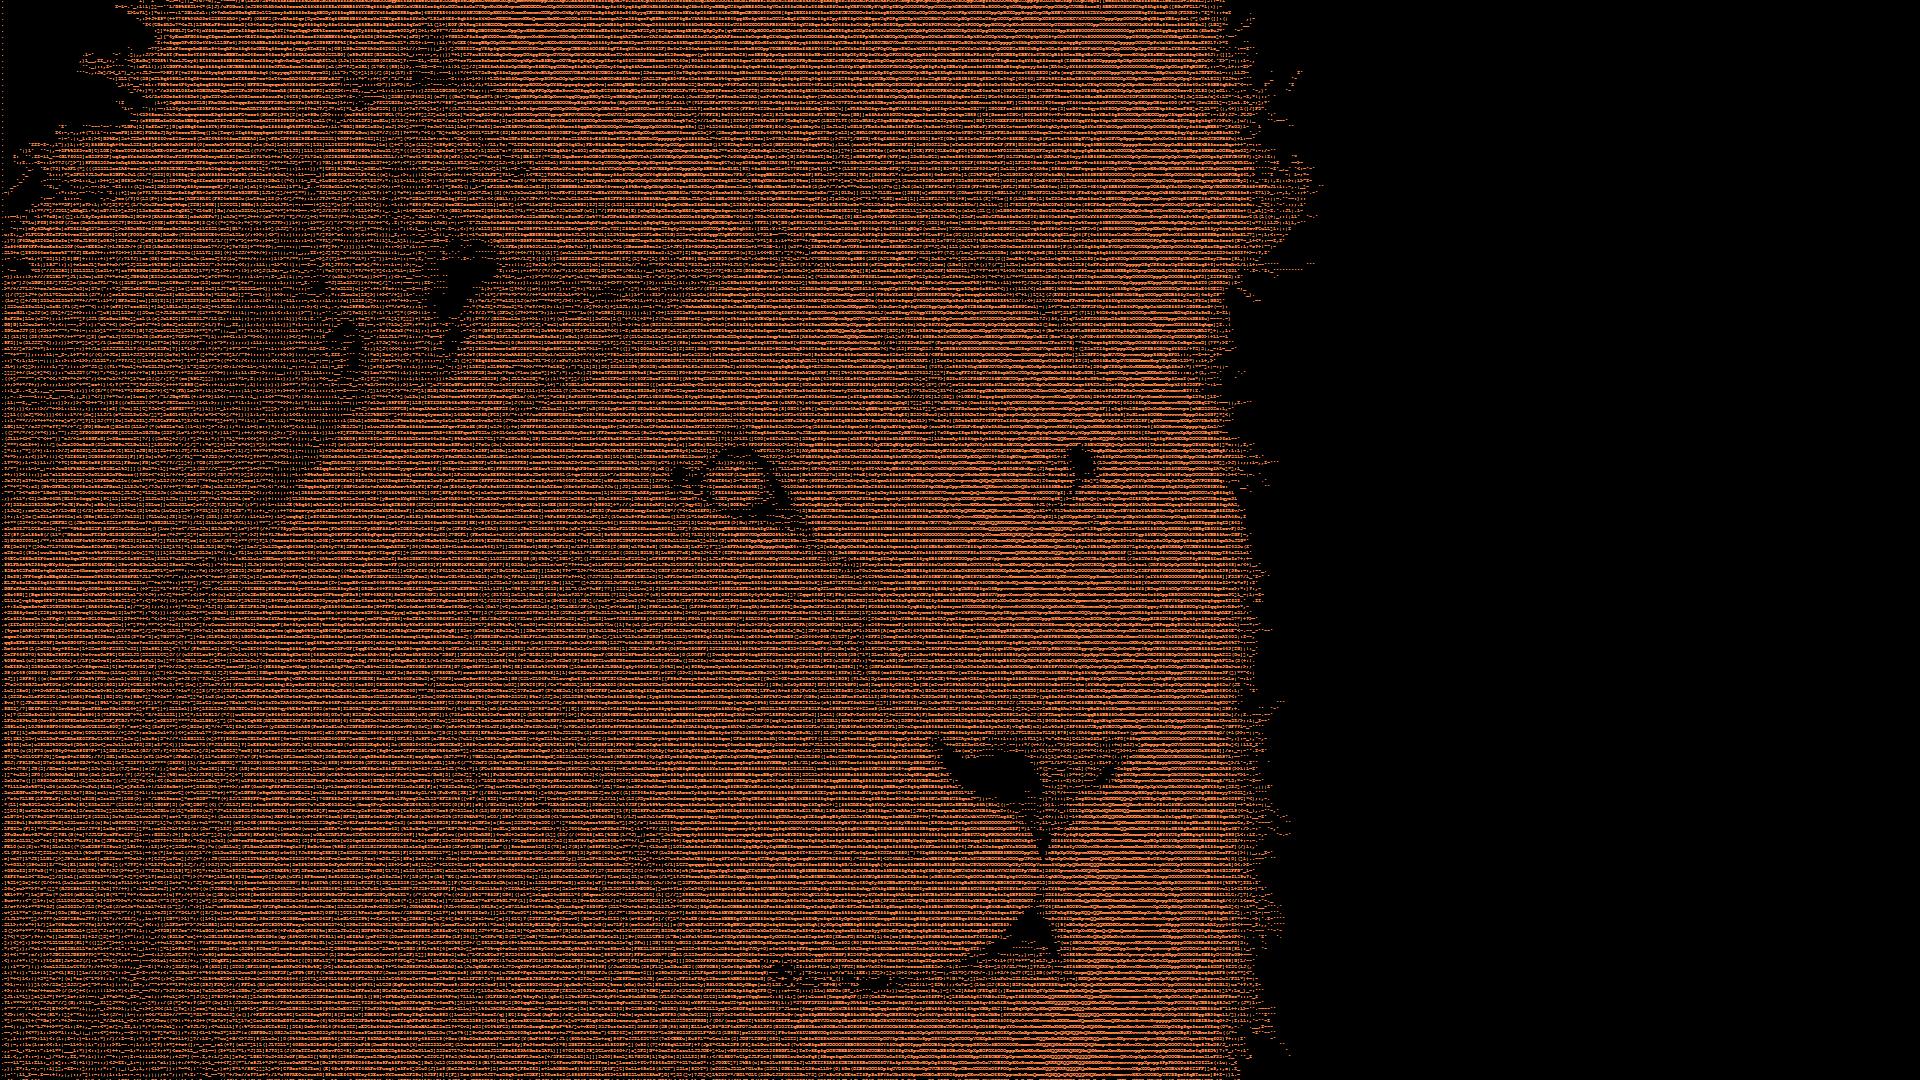 Wallpaper Ascii Art Lion Simple Minimalism Animals 1920x1080